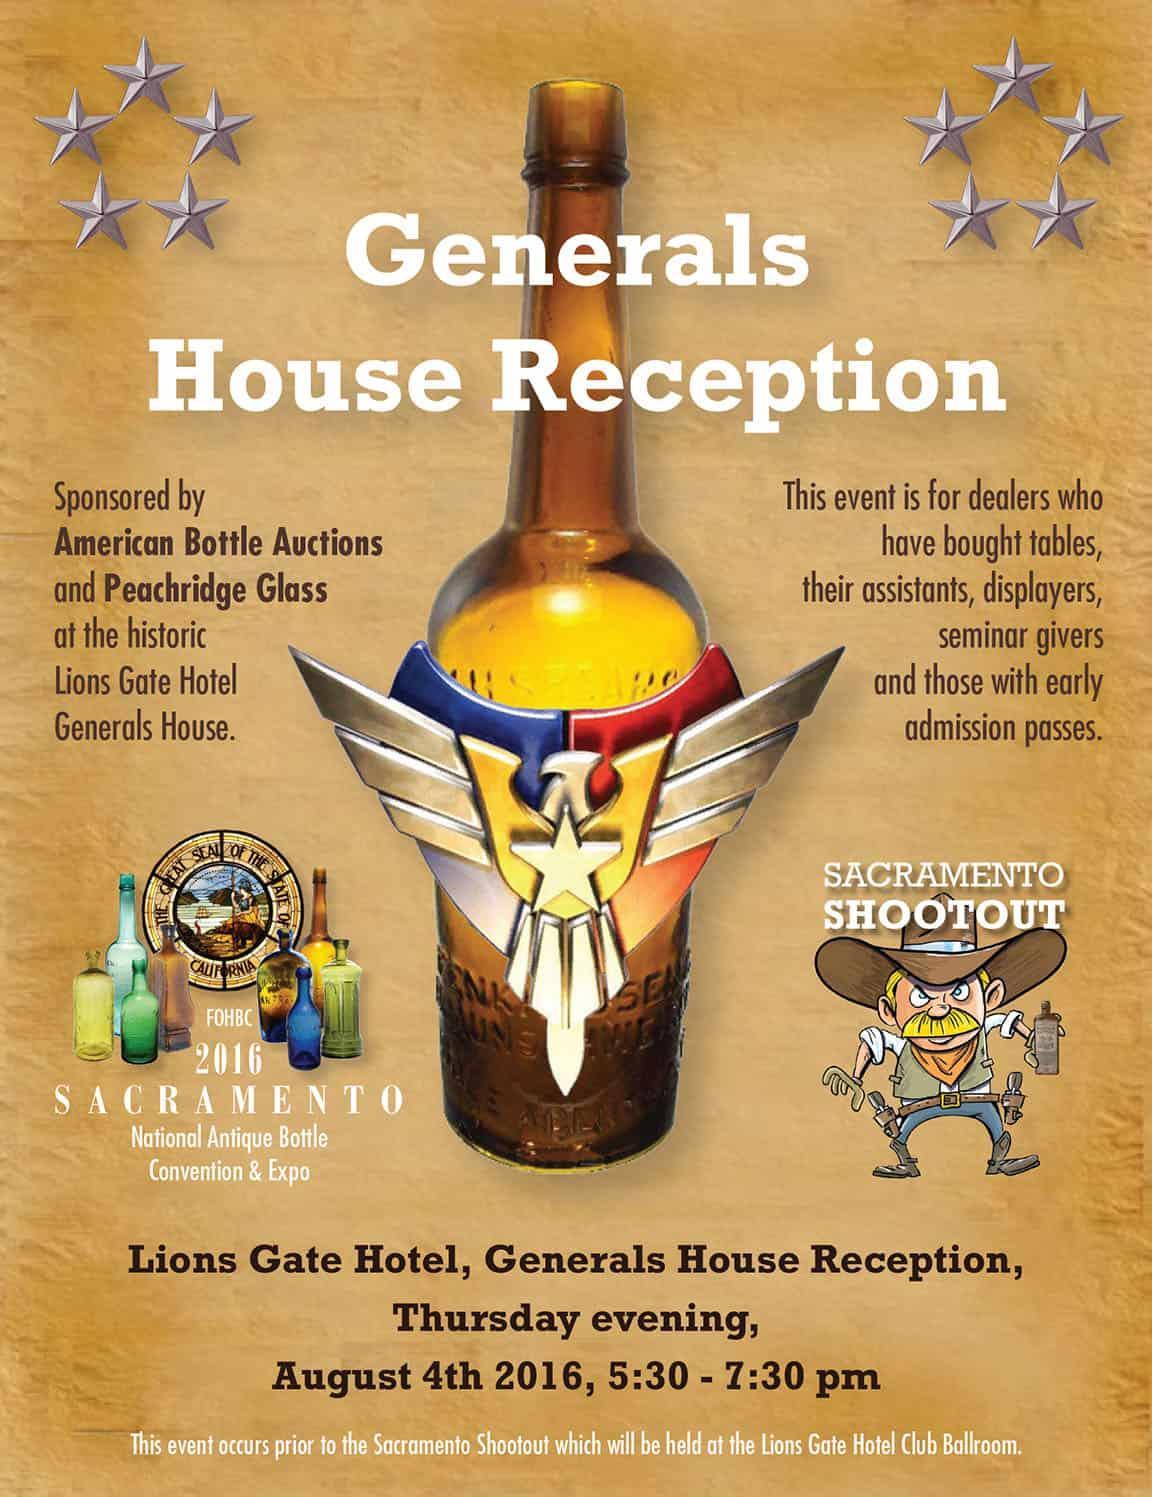 GeneralsHouseLogo